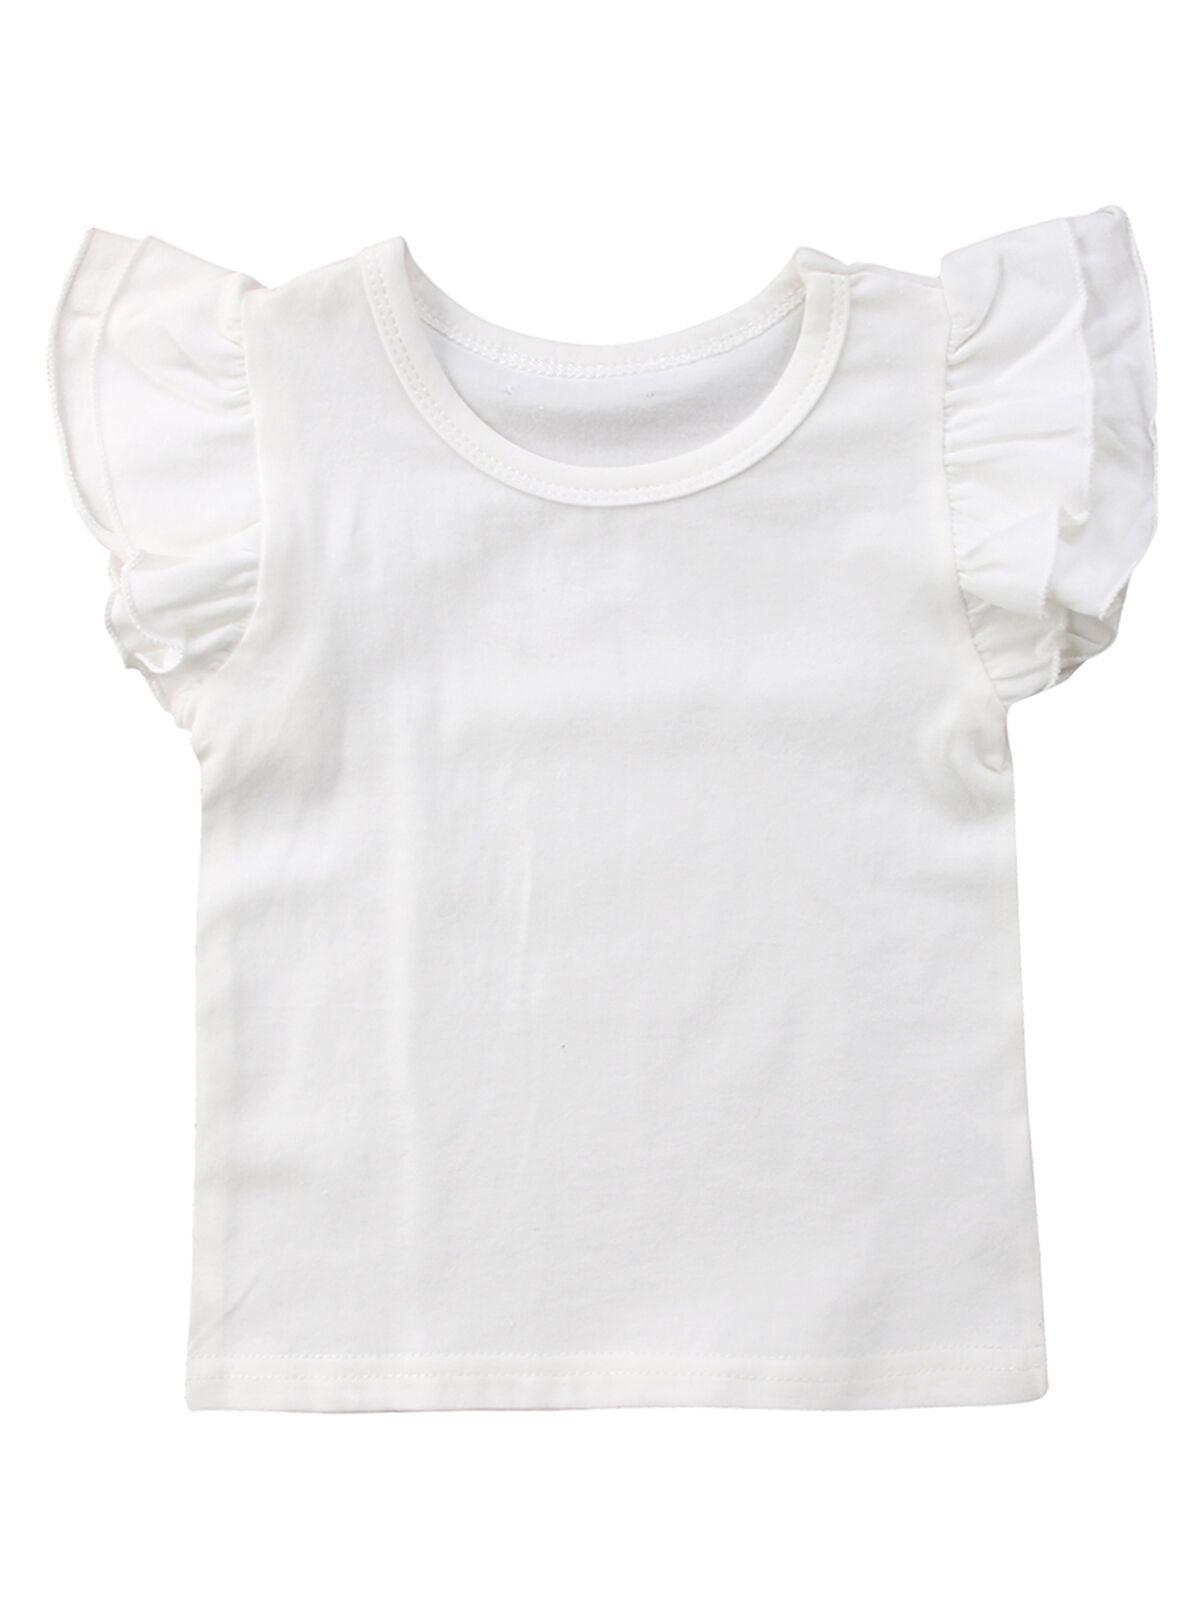 TAOHONG Womens Halloween Its Just A Bunch of Hocus Pocus Shirt Sanderson Sisters Raglan Long Sleeve T Shirt